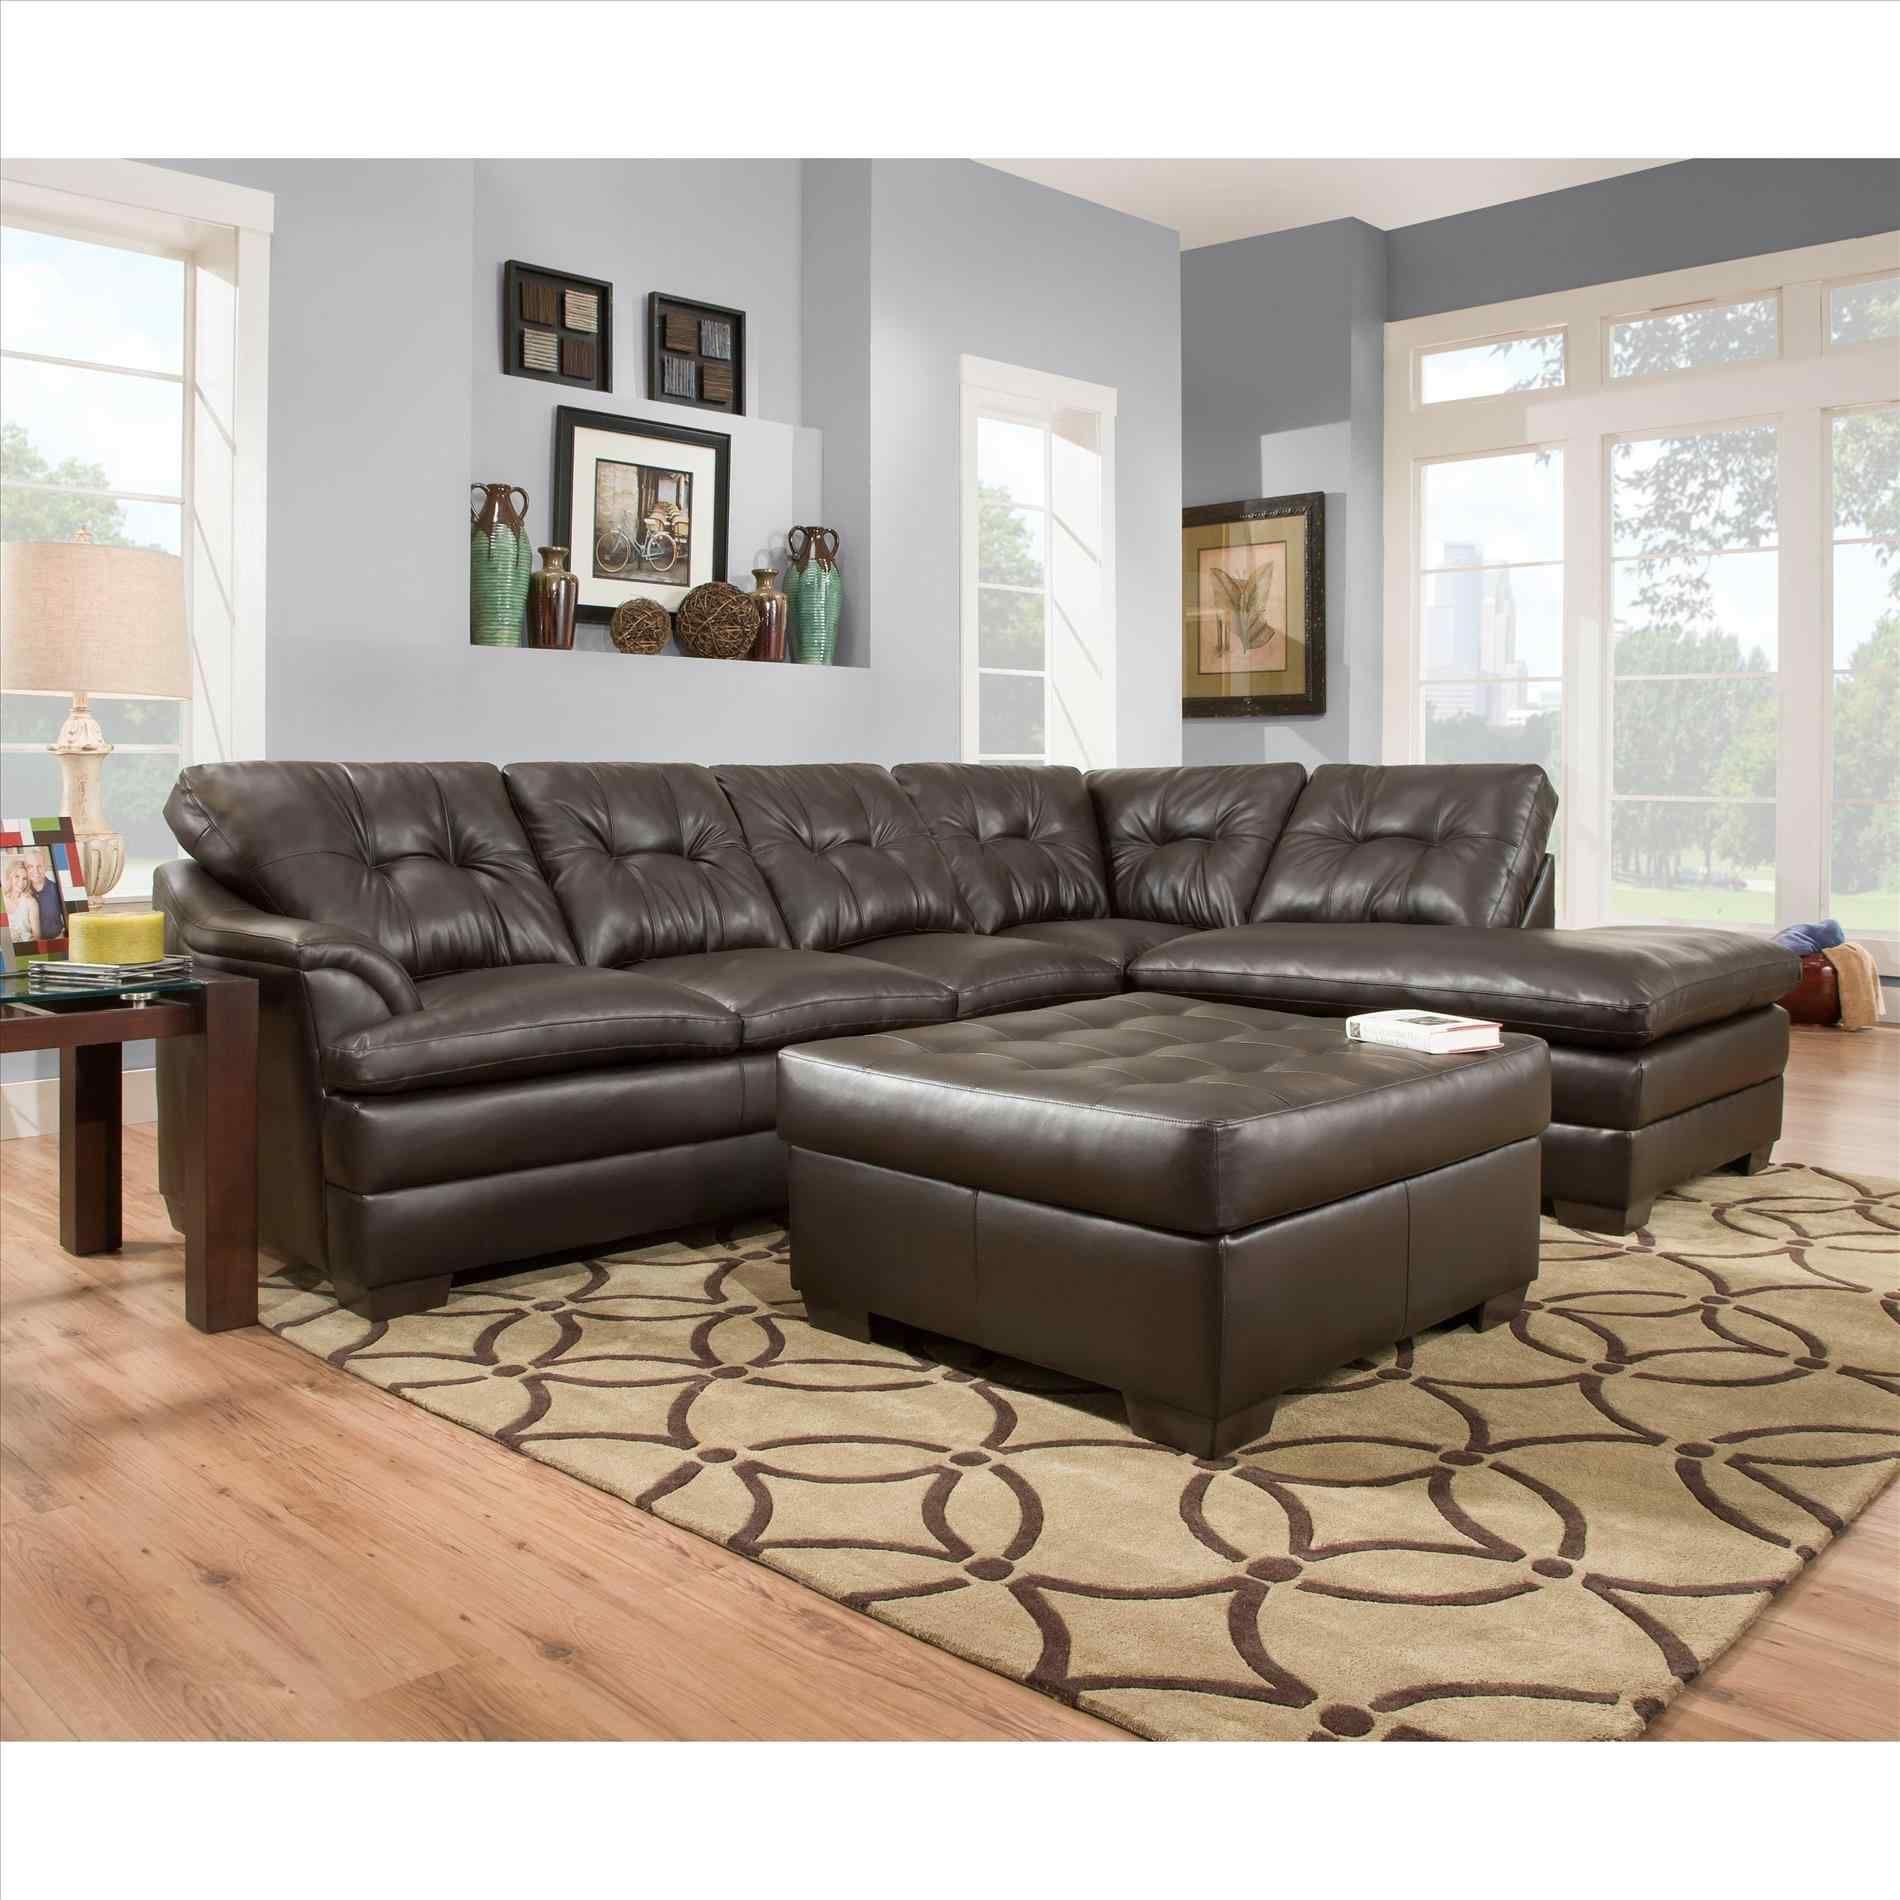 Incroyable Sectional Sofa Reviews Run Upholstery Daisy U Wayfair Microfiber Microfiber Simmons  Sectional Sofa Reviews Garnet Ii Garnet Simmons Sectional Sofa Reviews ...